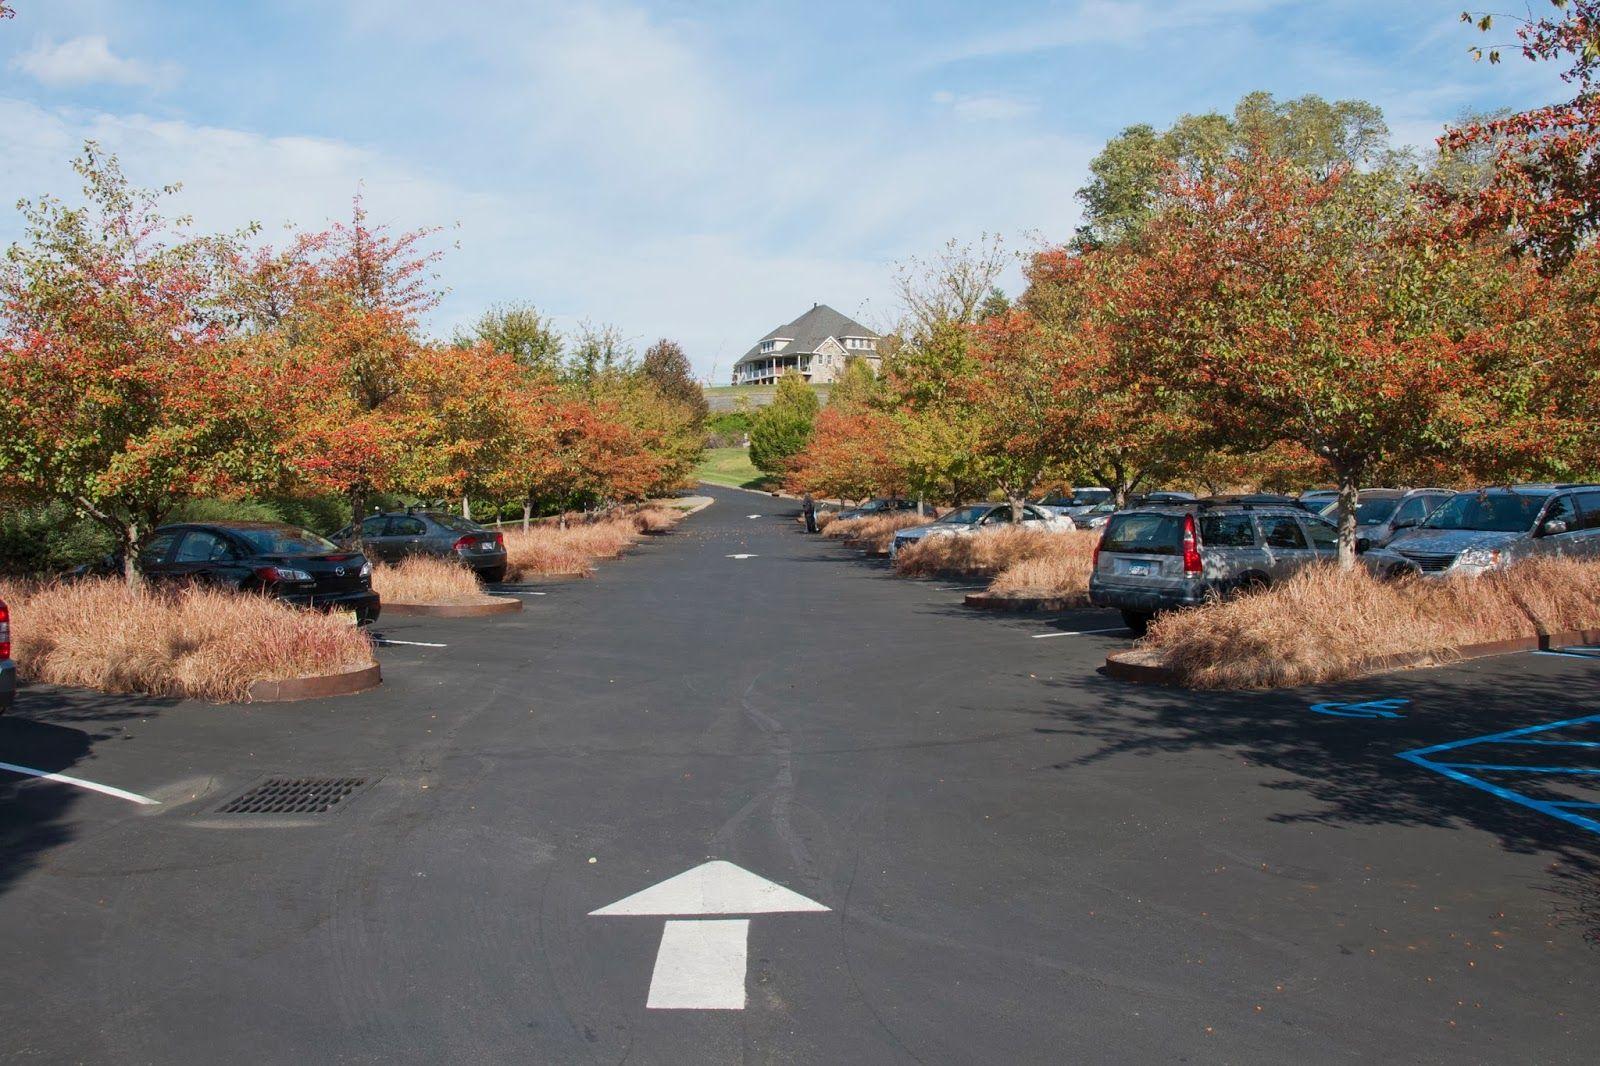 Dia Beacon Parking Lot Landschap